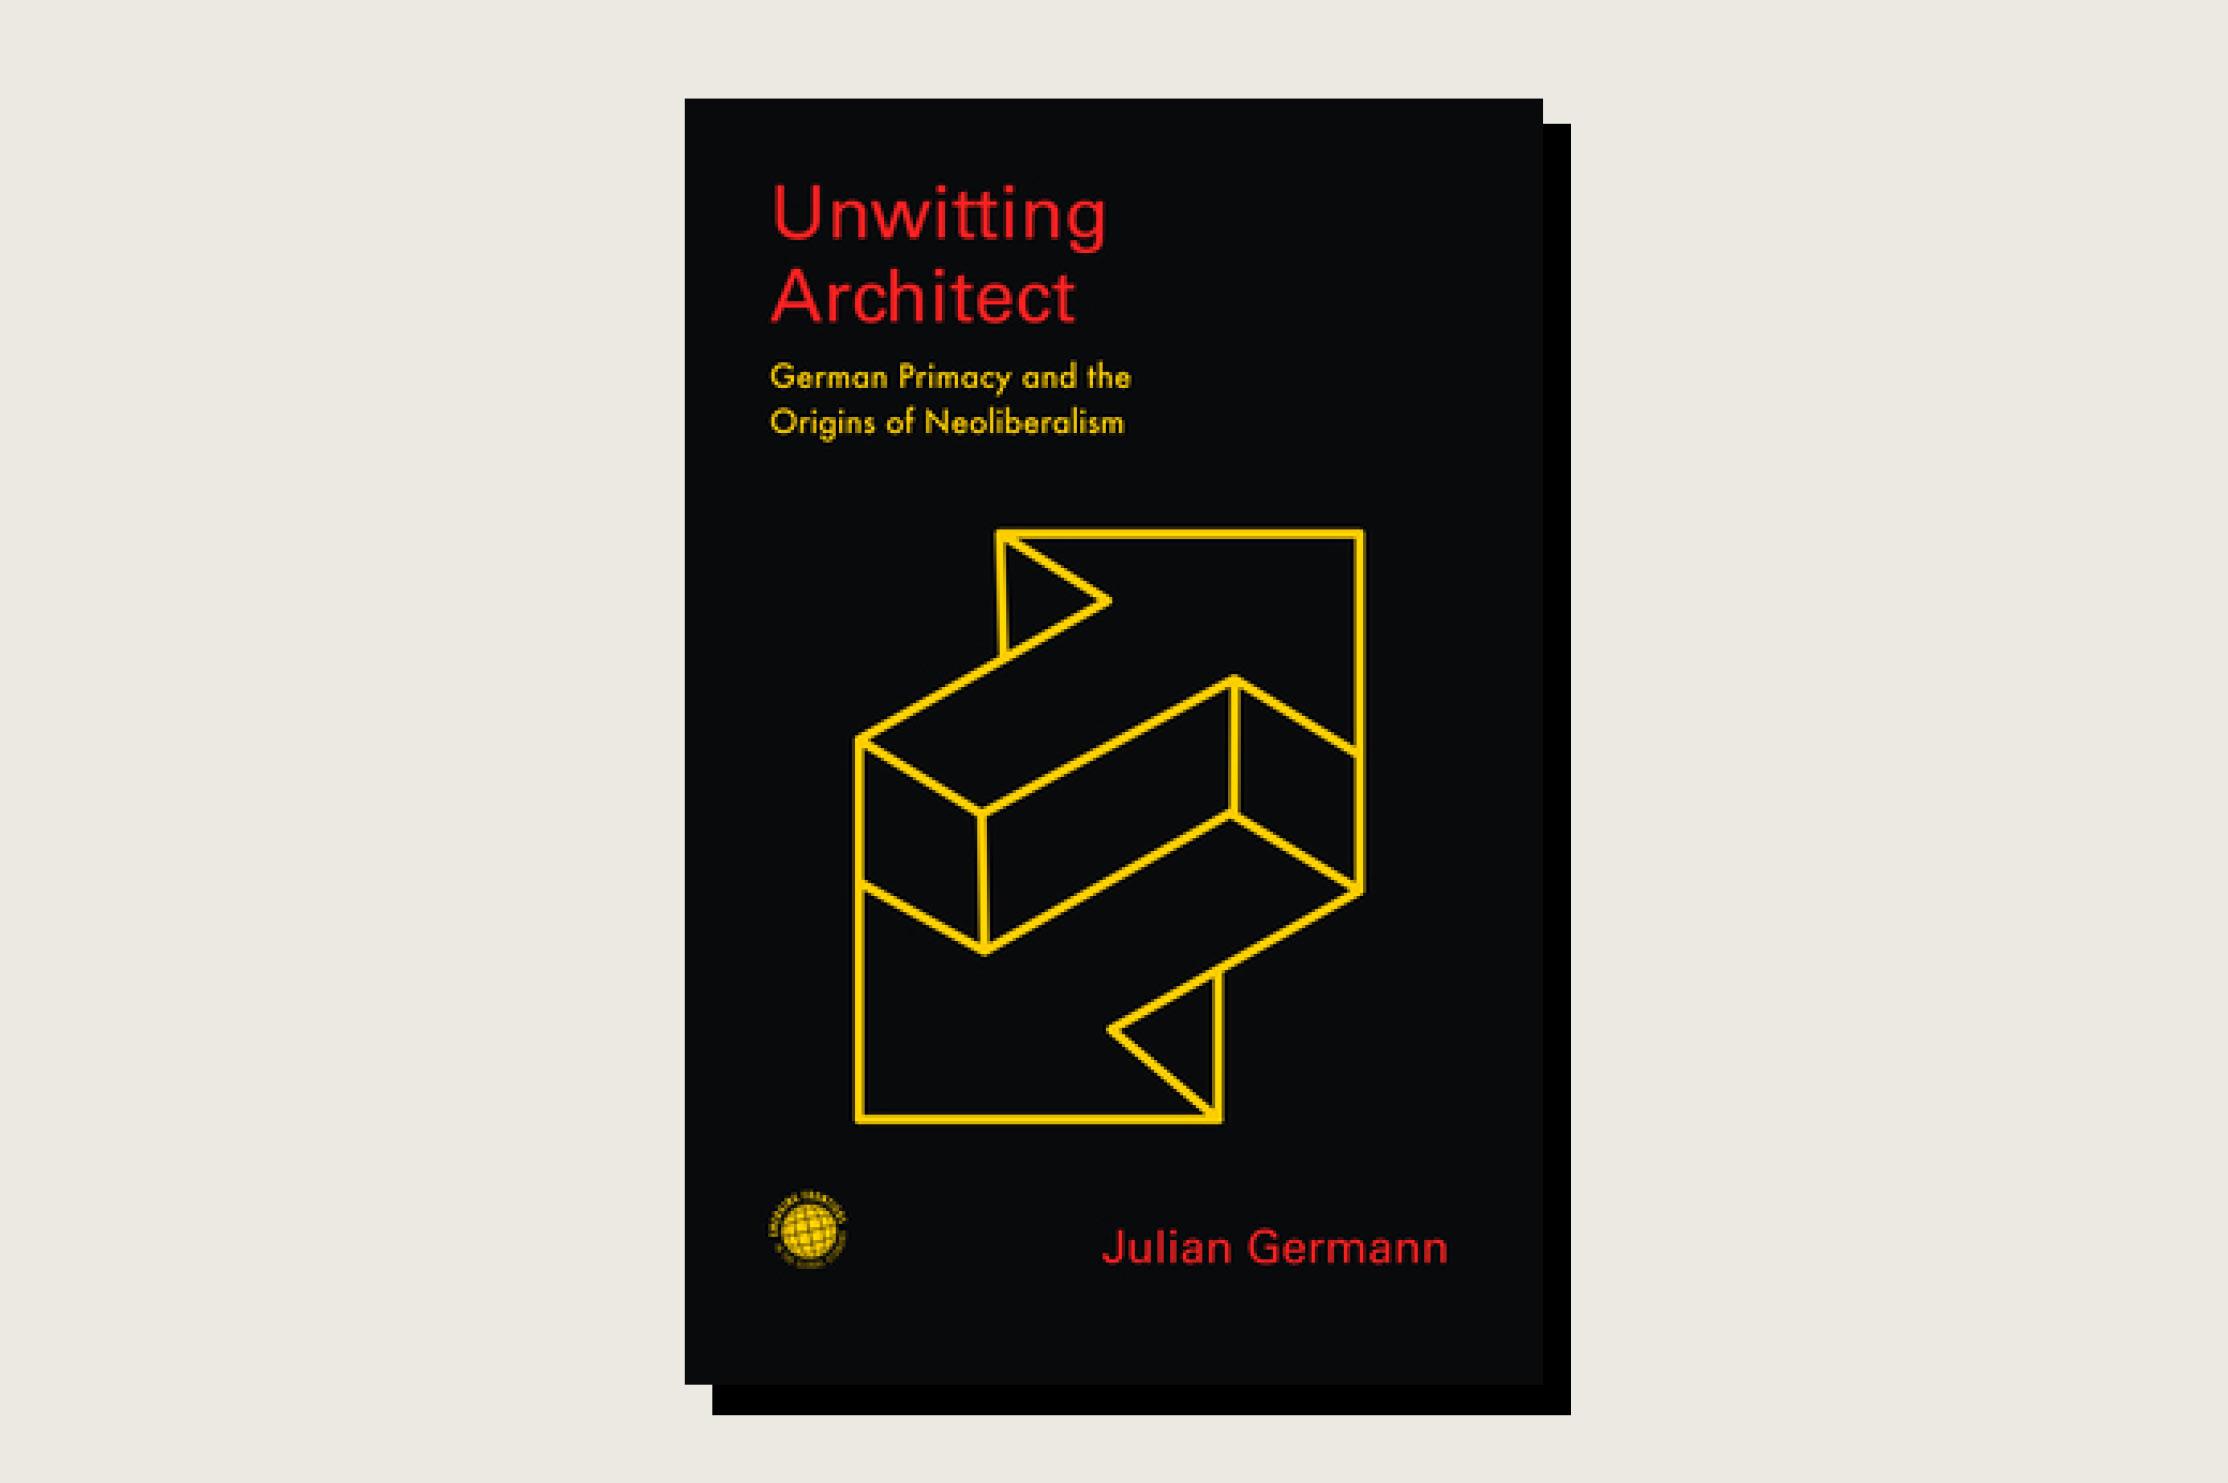 Unwitting Architect: German Primacy and the Origins of Neoliberalism, Julian Germann, Stanford University Press, 304 pp., , January 2021